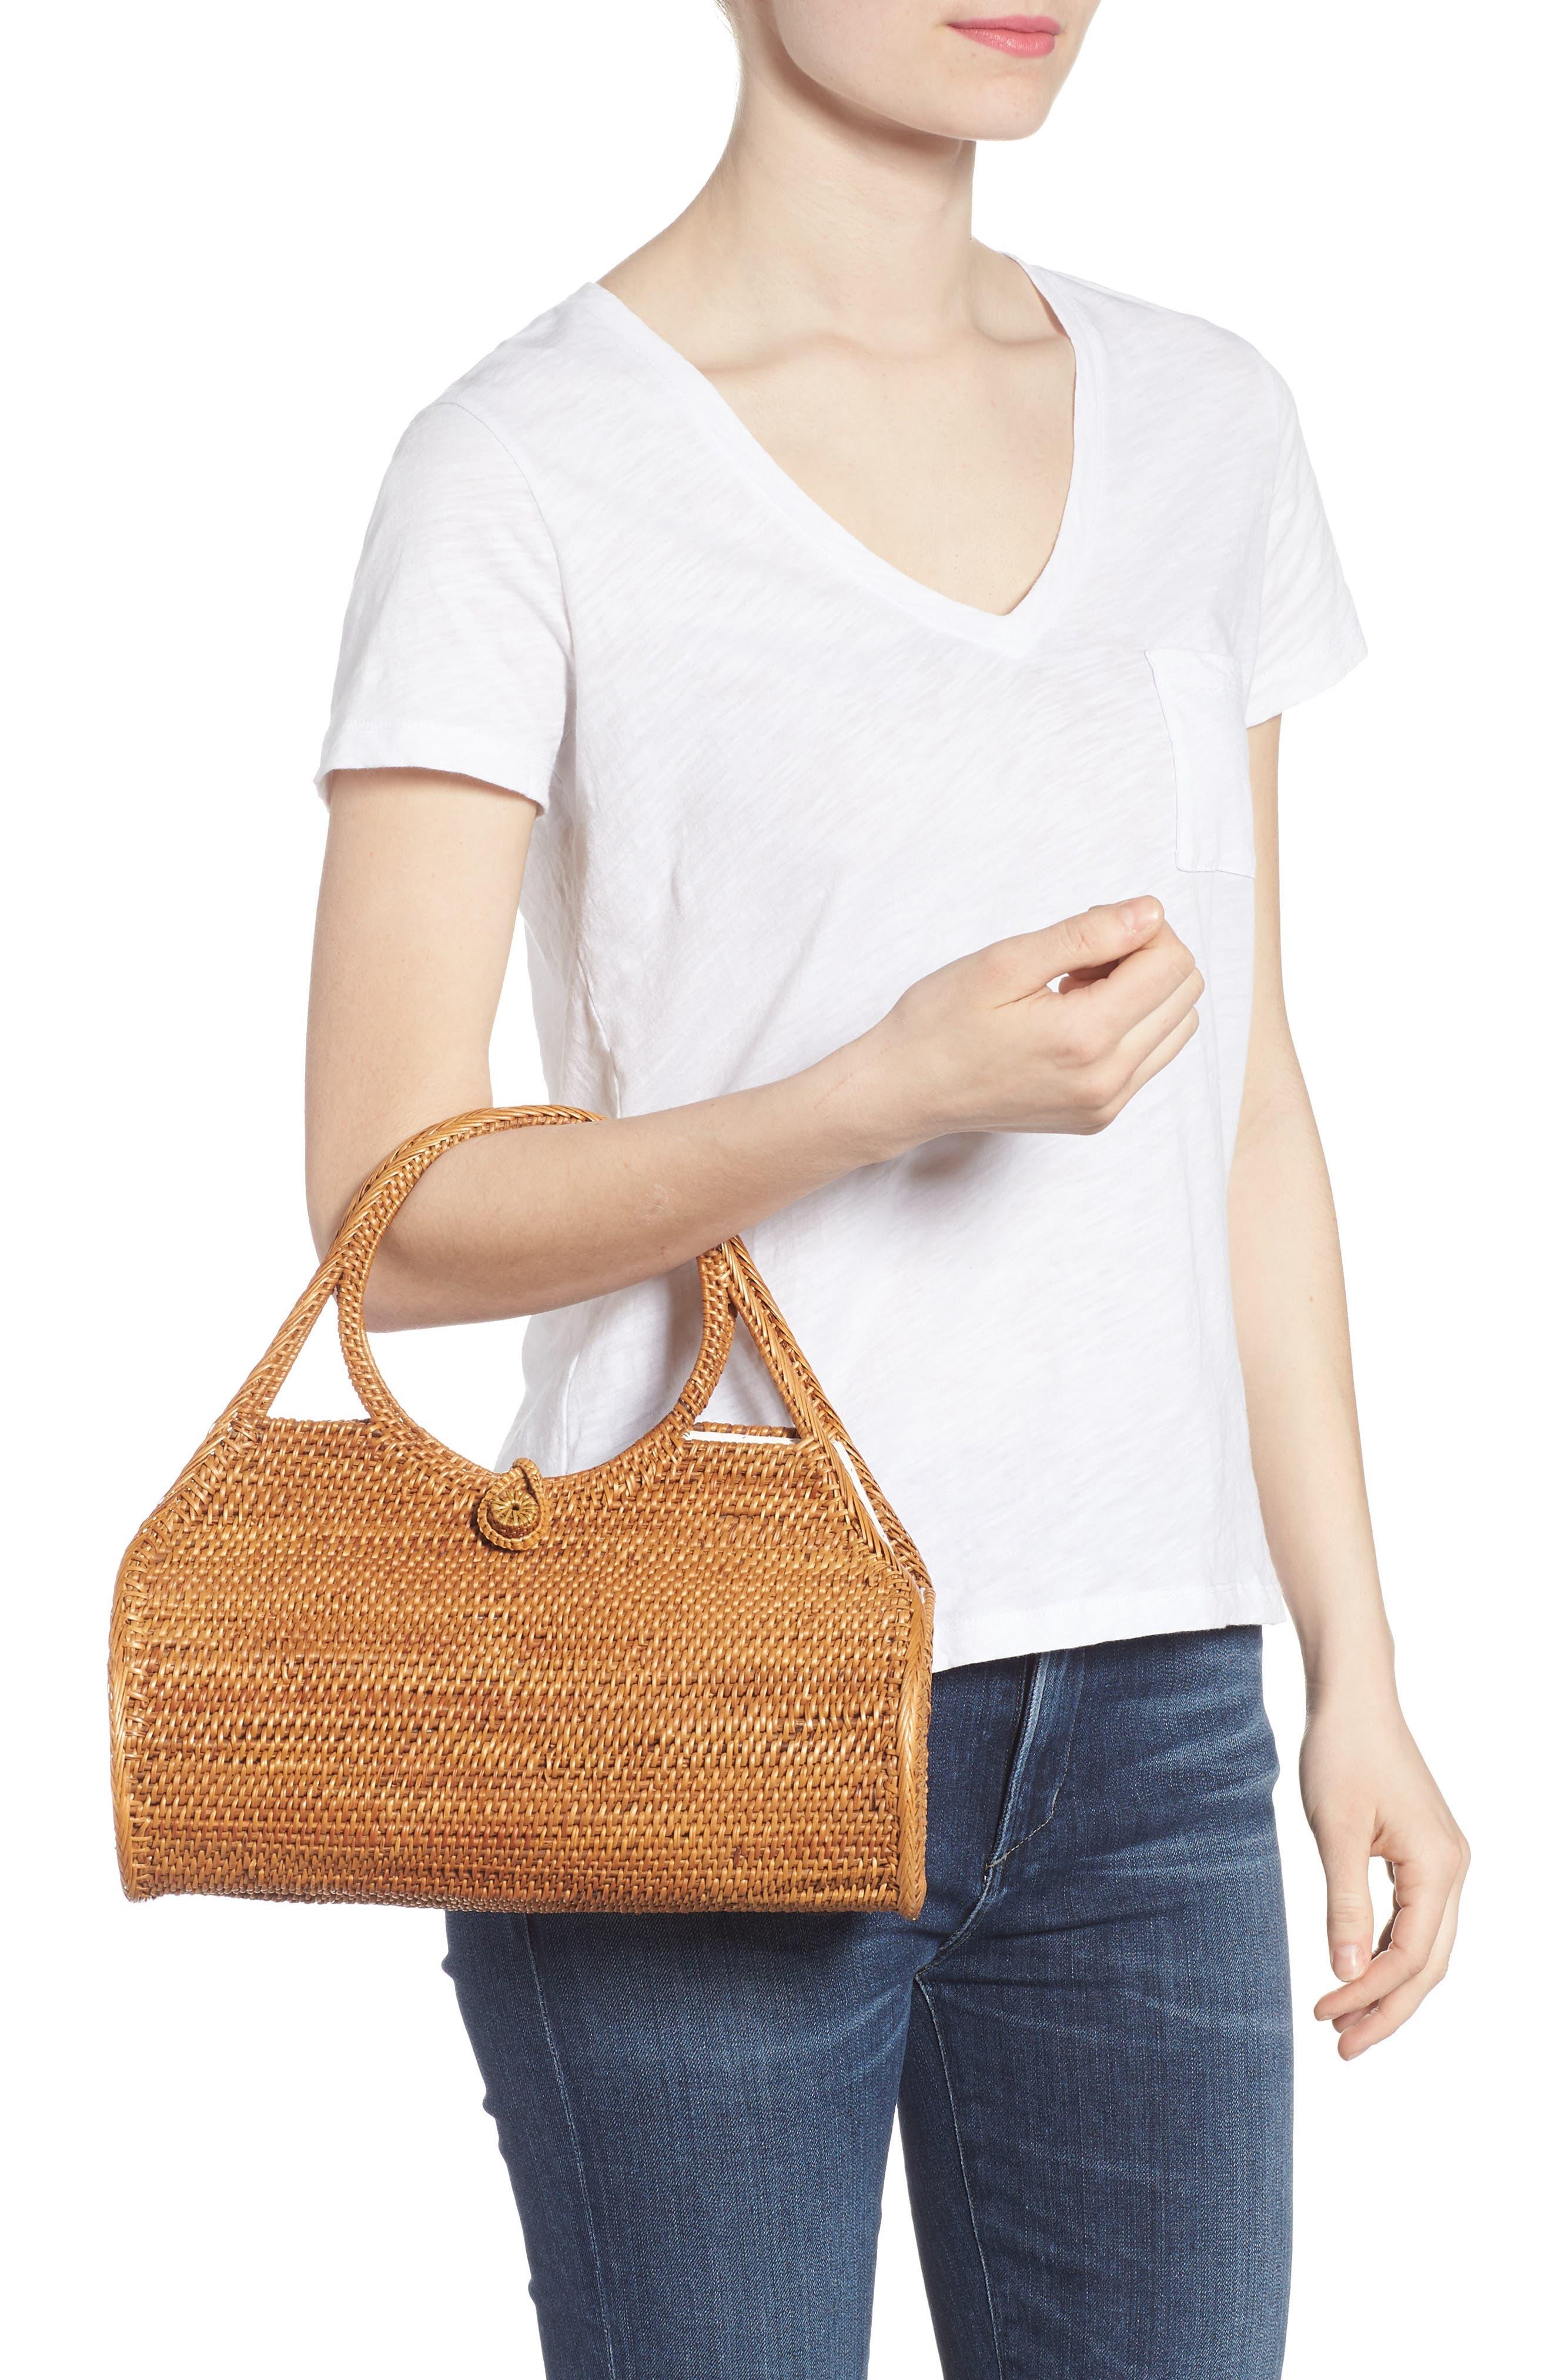 Woven Rattan Handbag,                             Alternate thumbnail 2, color,                             Tan